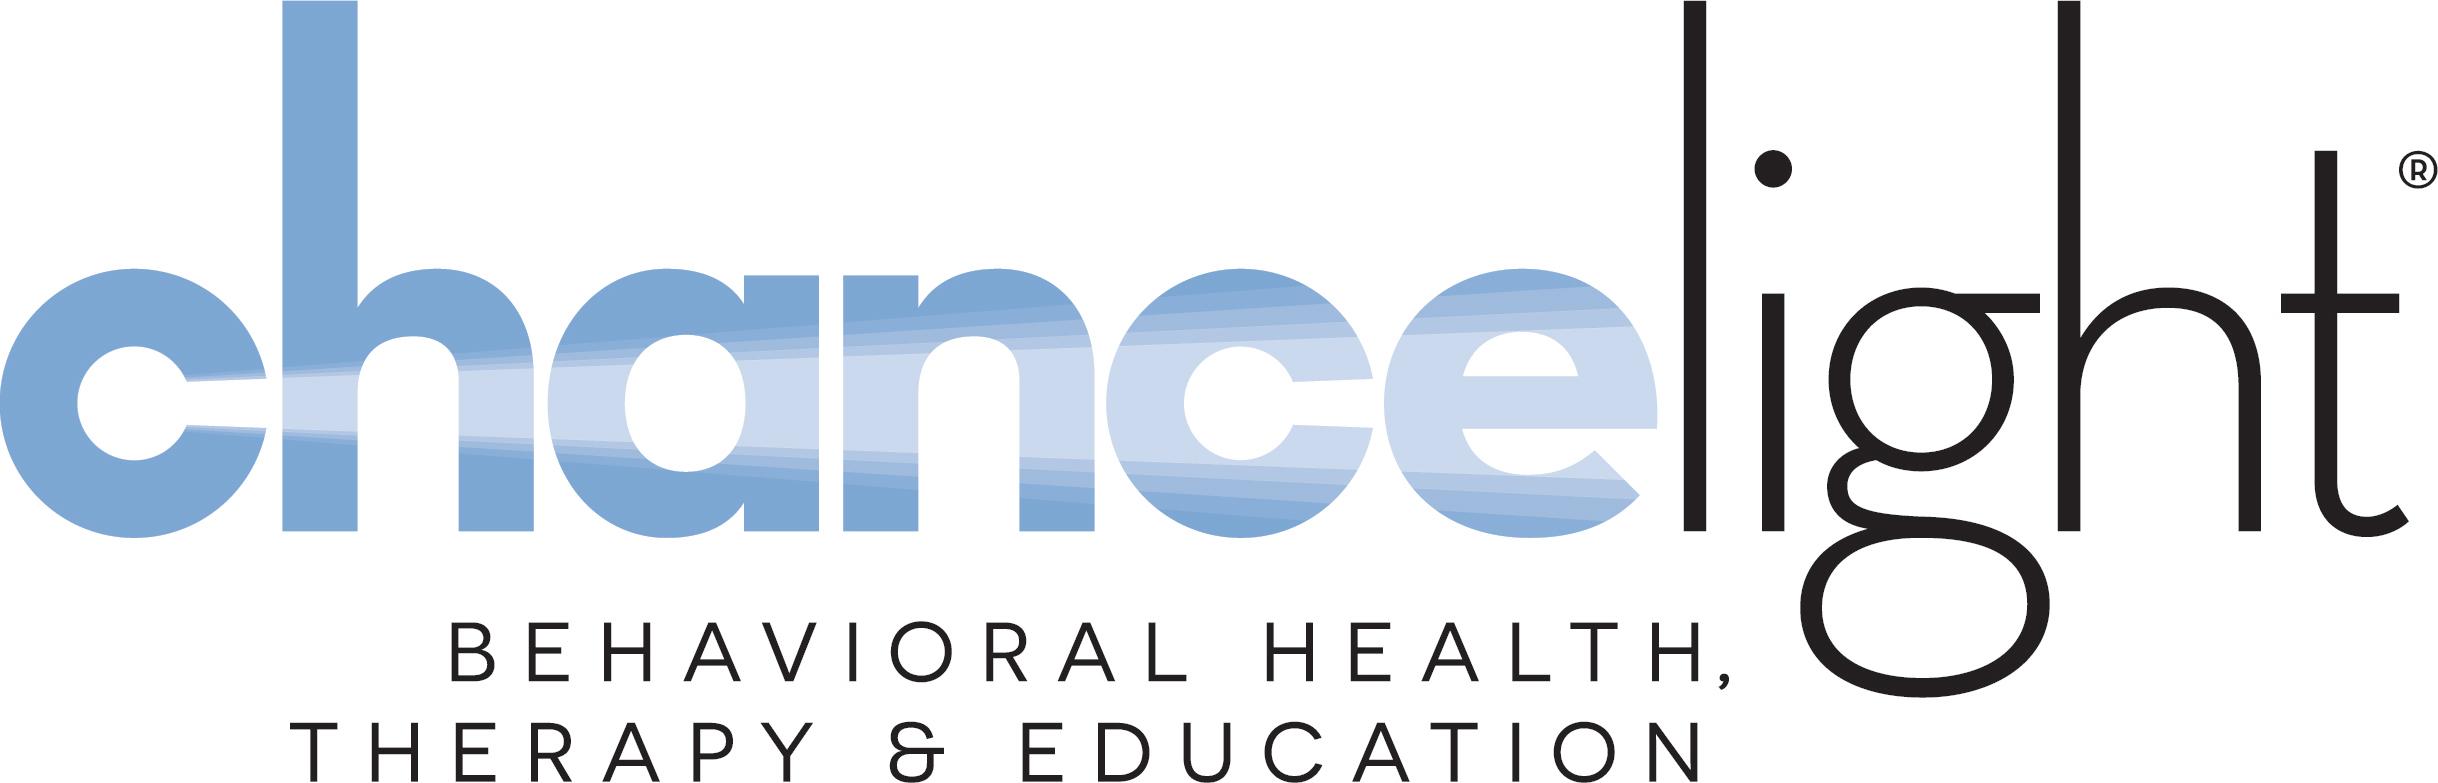 chancelight-print-h-logo-blueblack-®